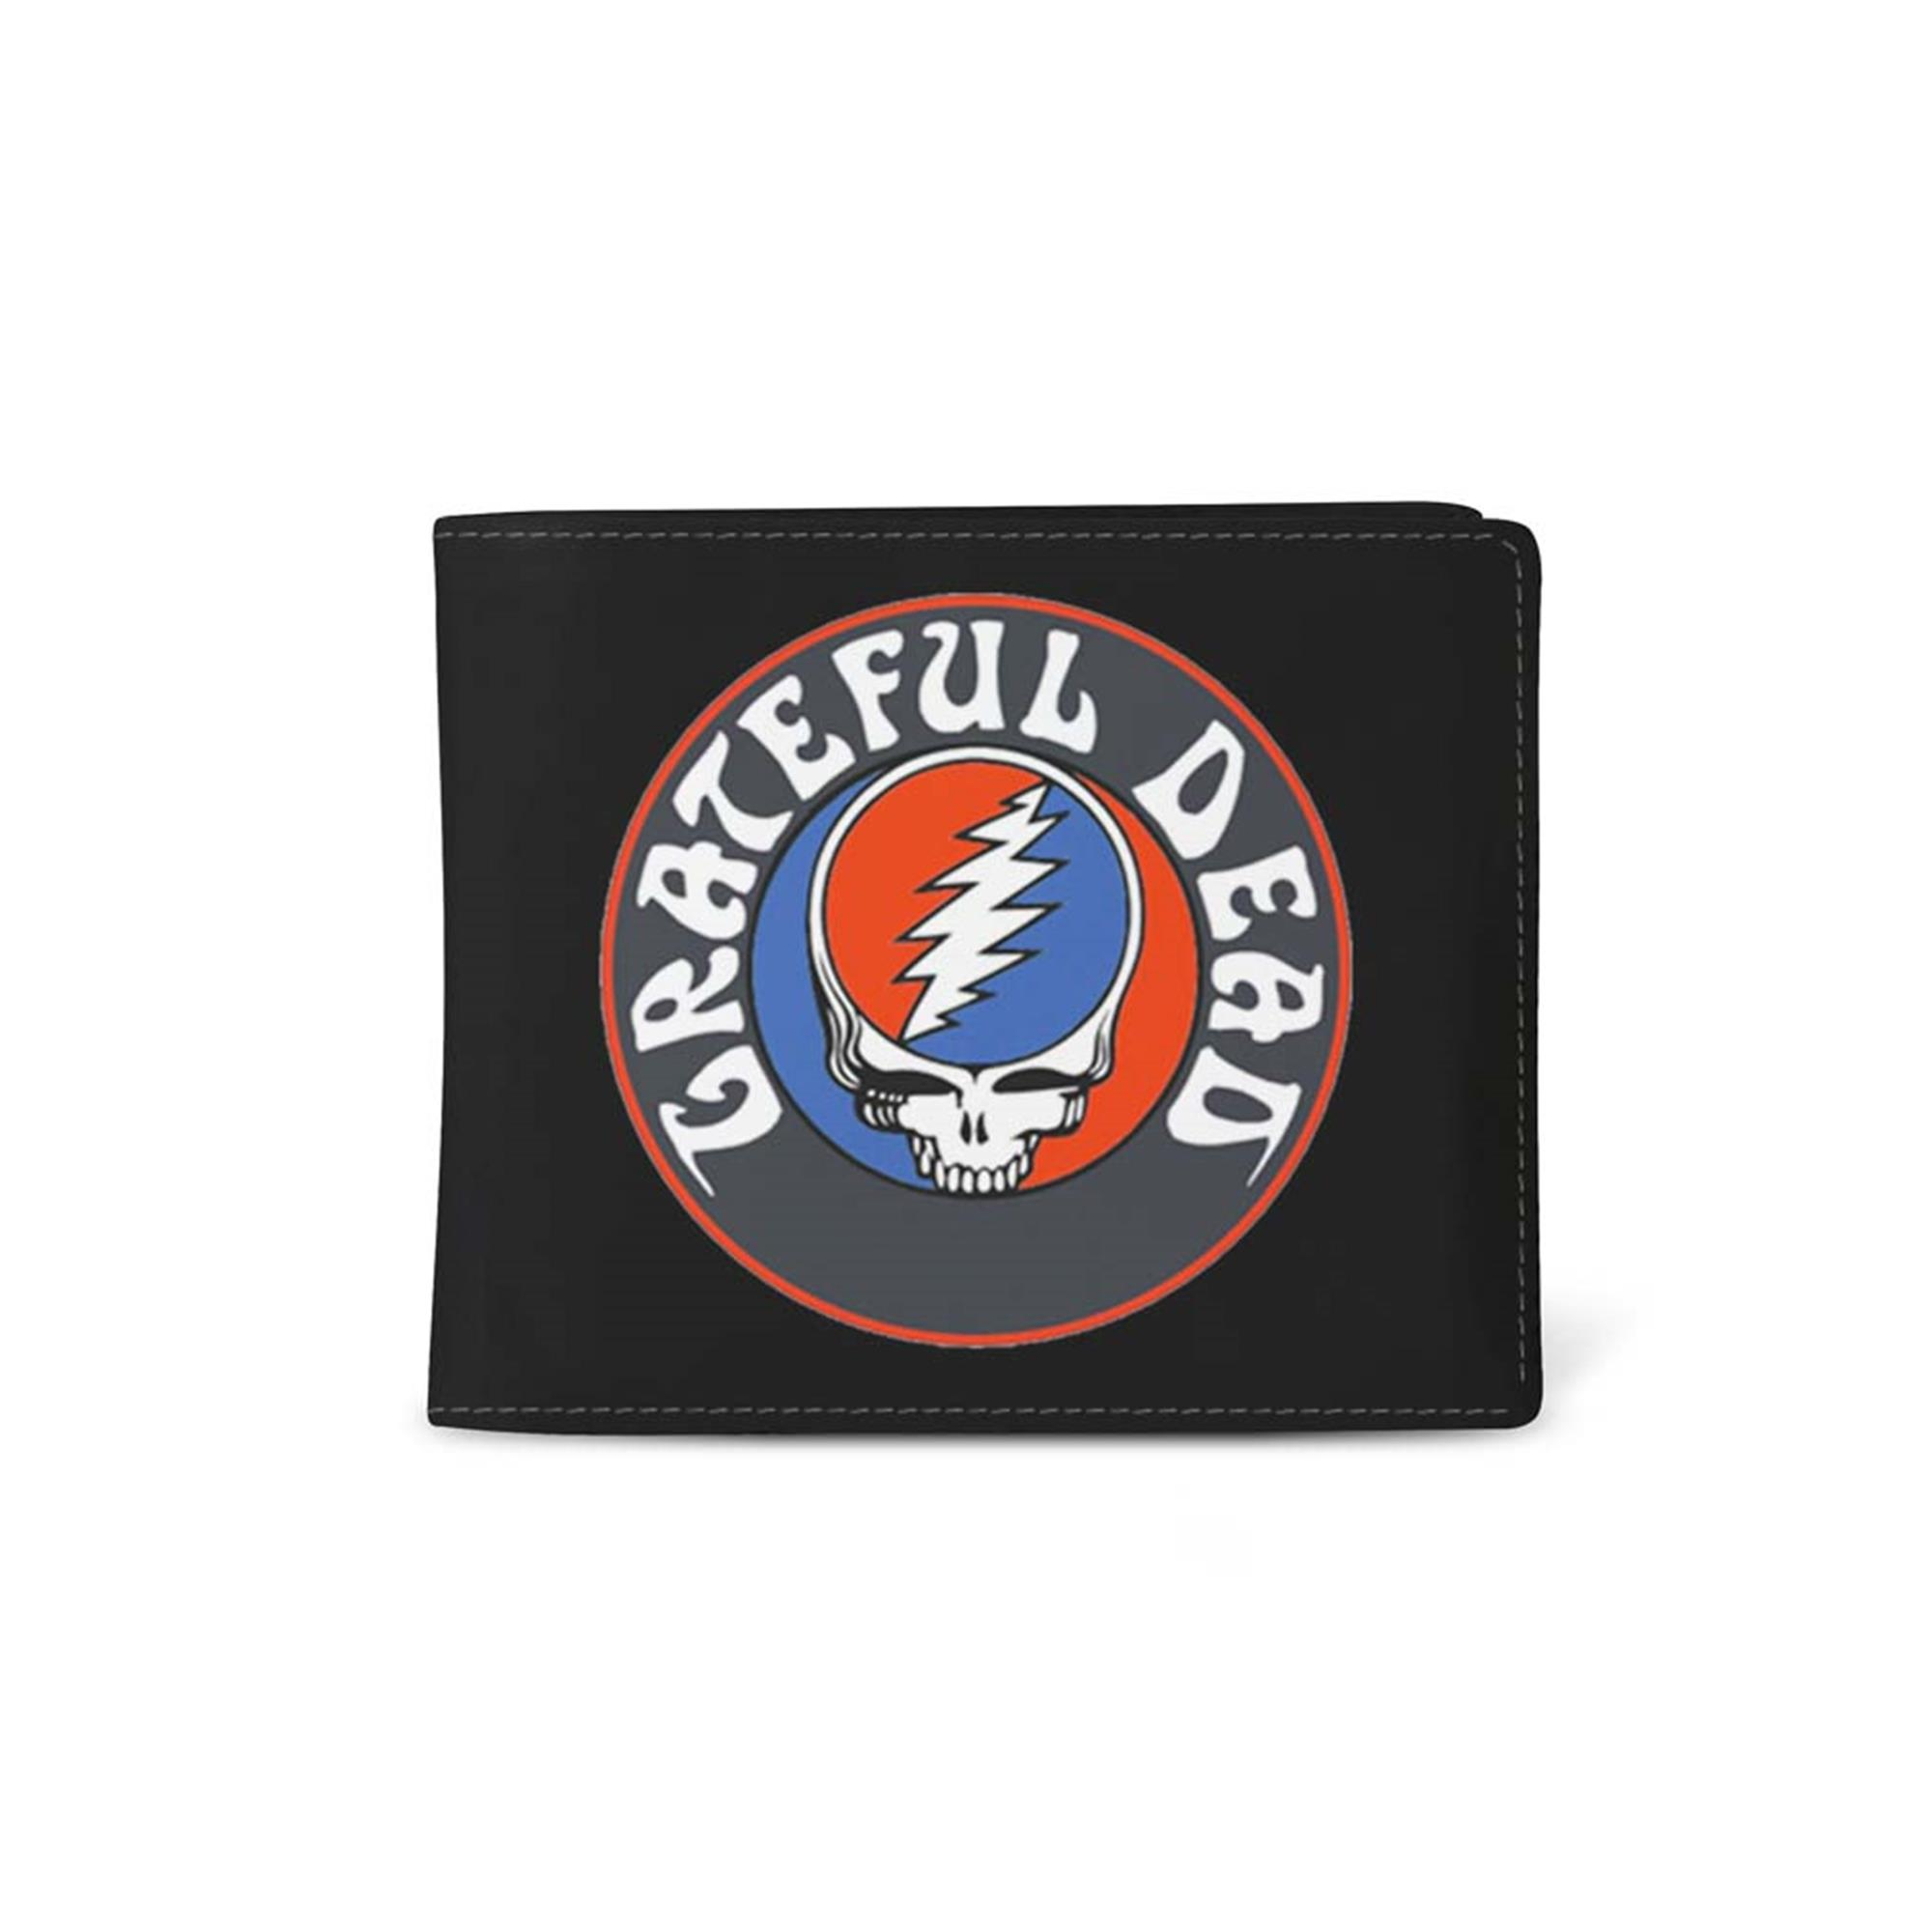 Grateful Dead Wallet